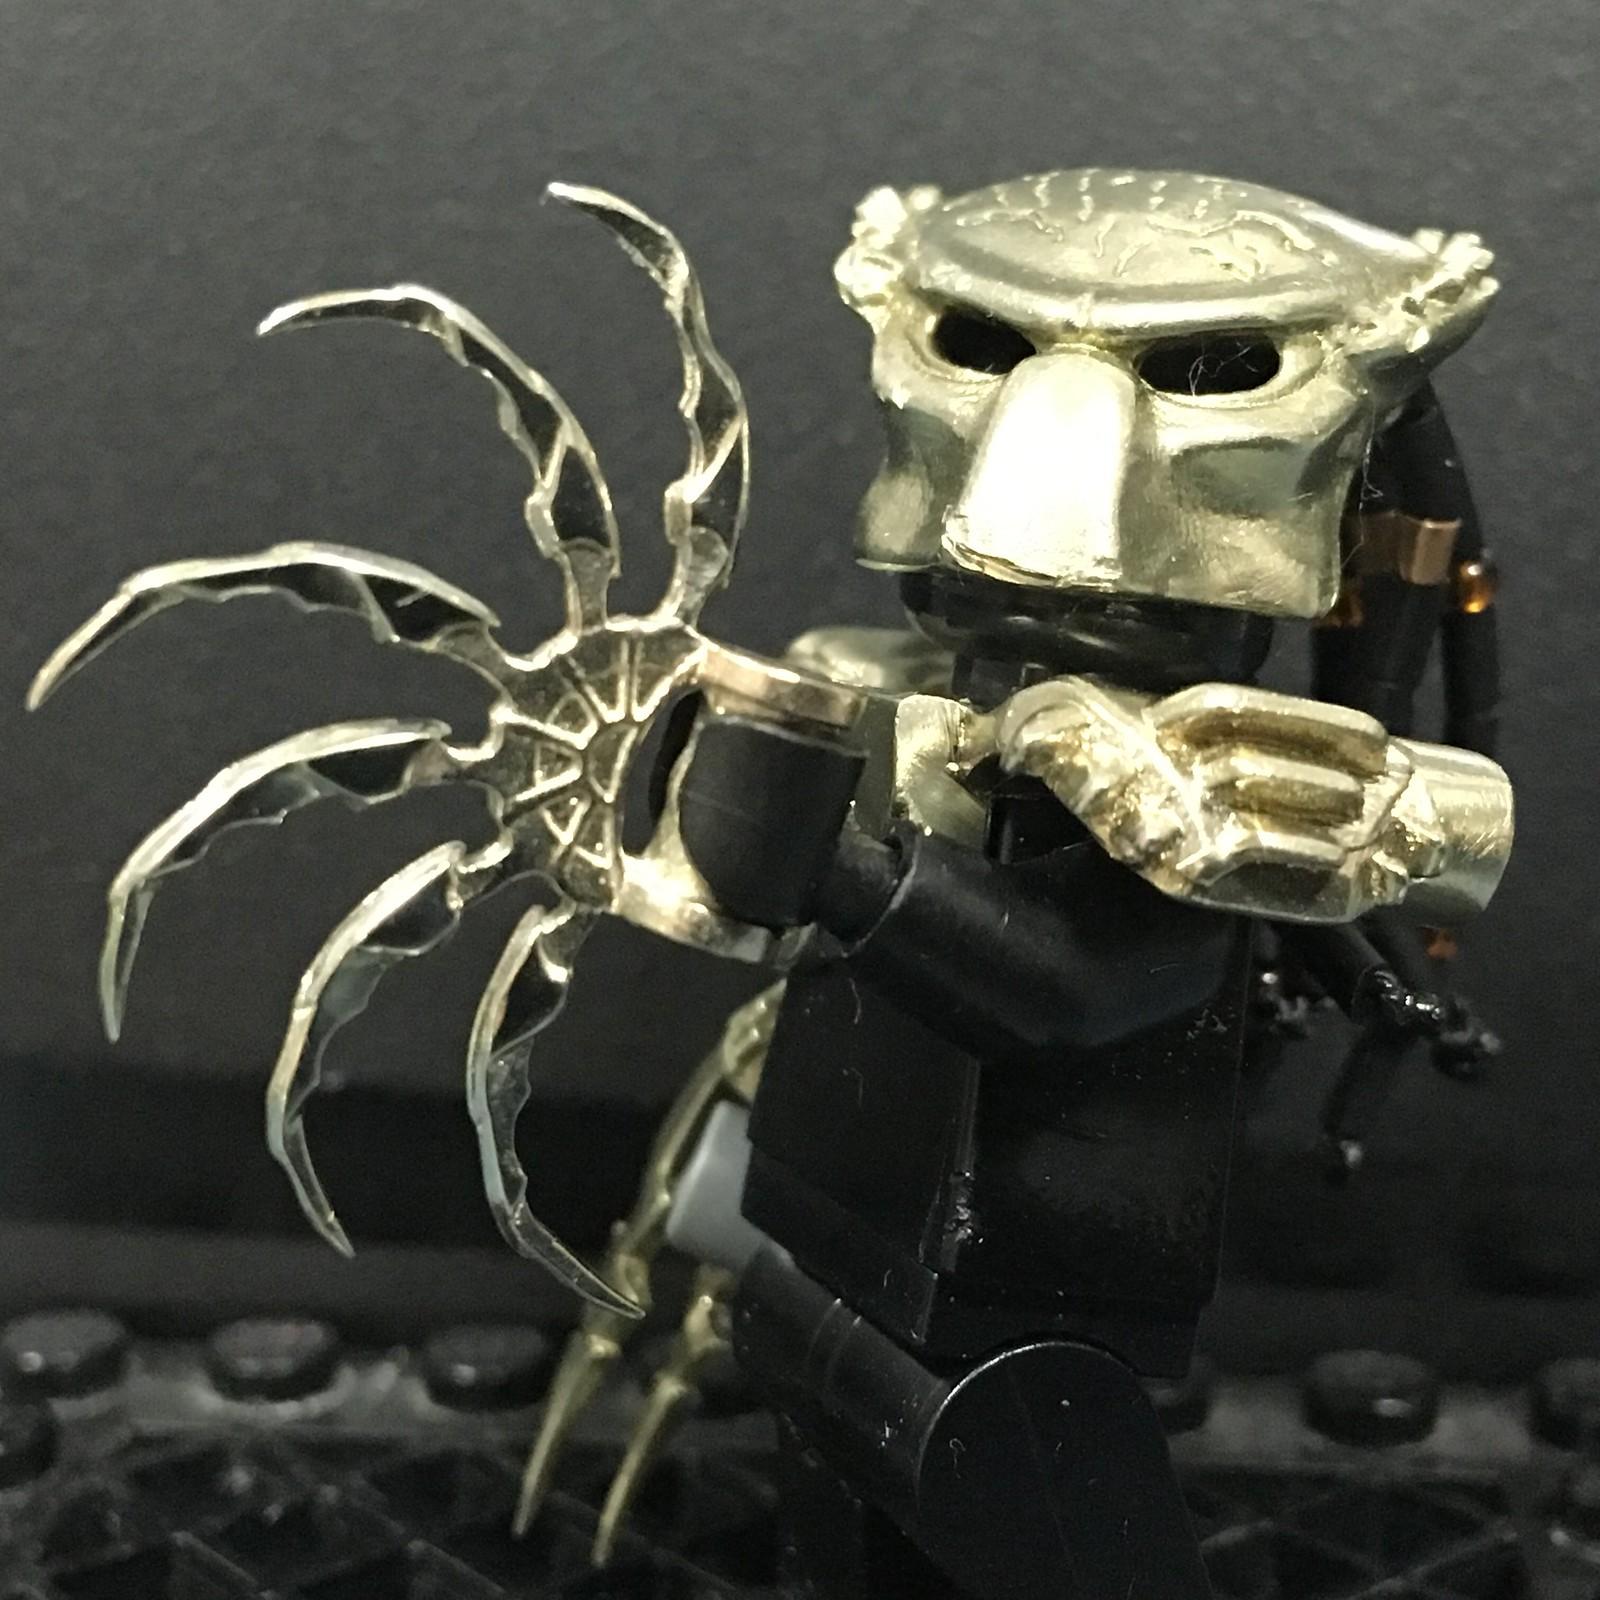 new weapons - shuriken